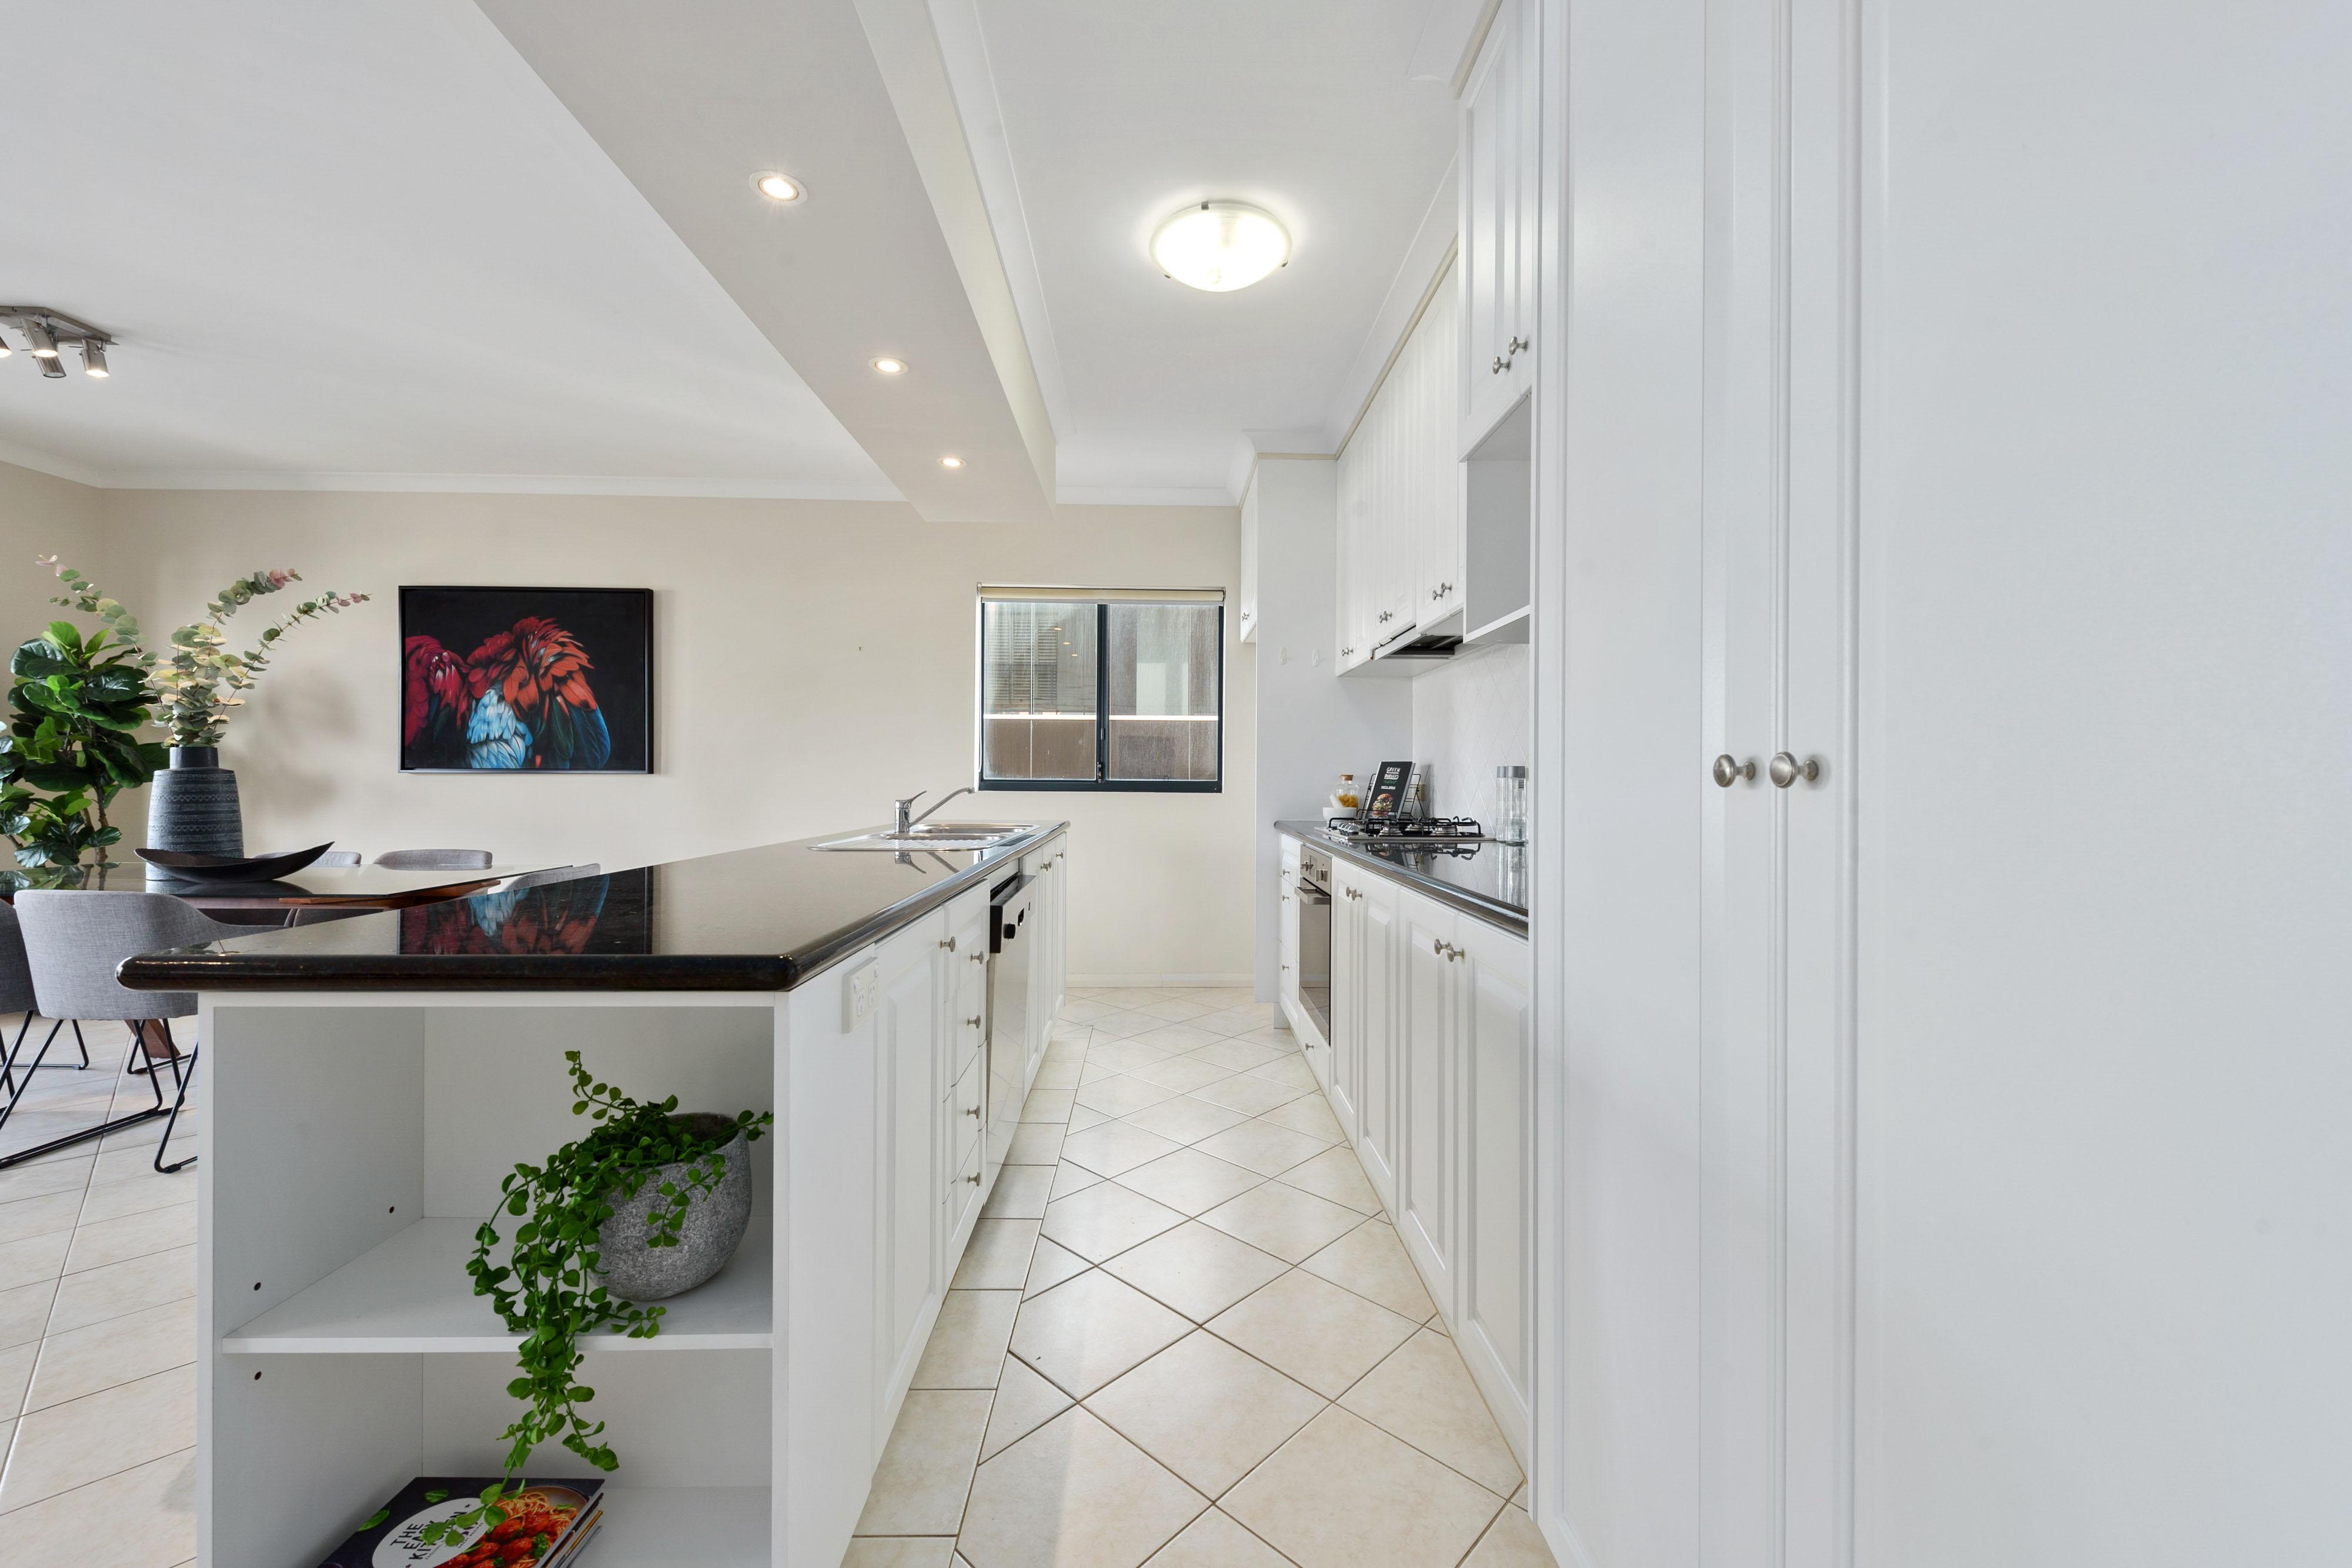 PRINT 20 45 Ord Street, West Perth 23